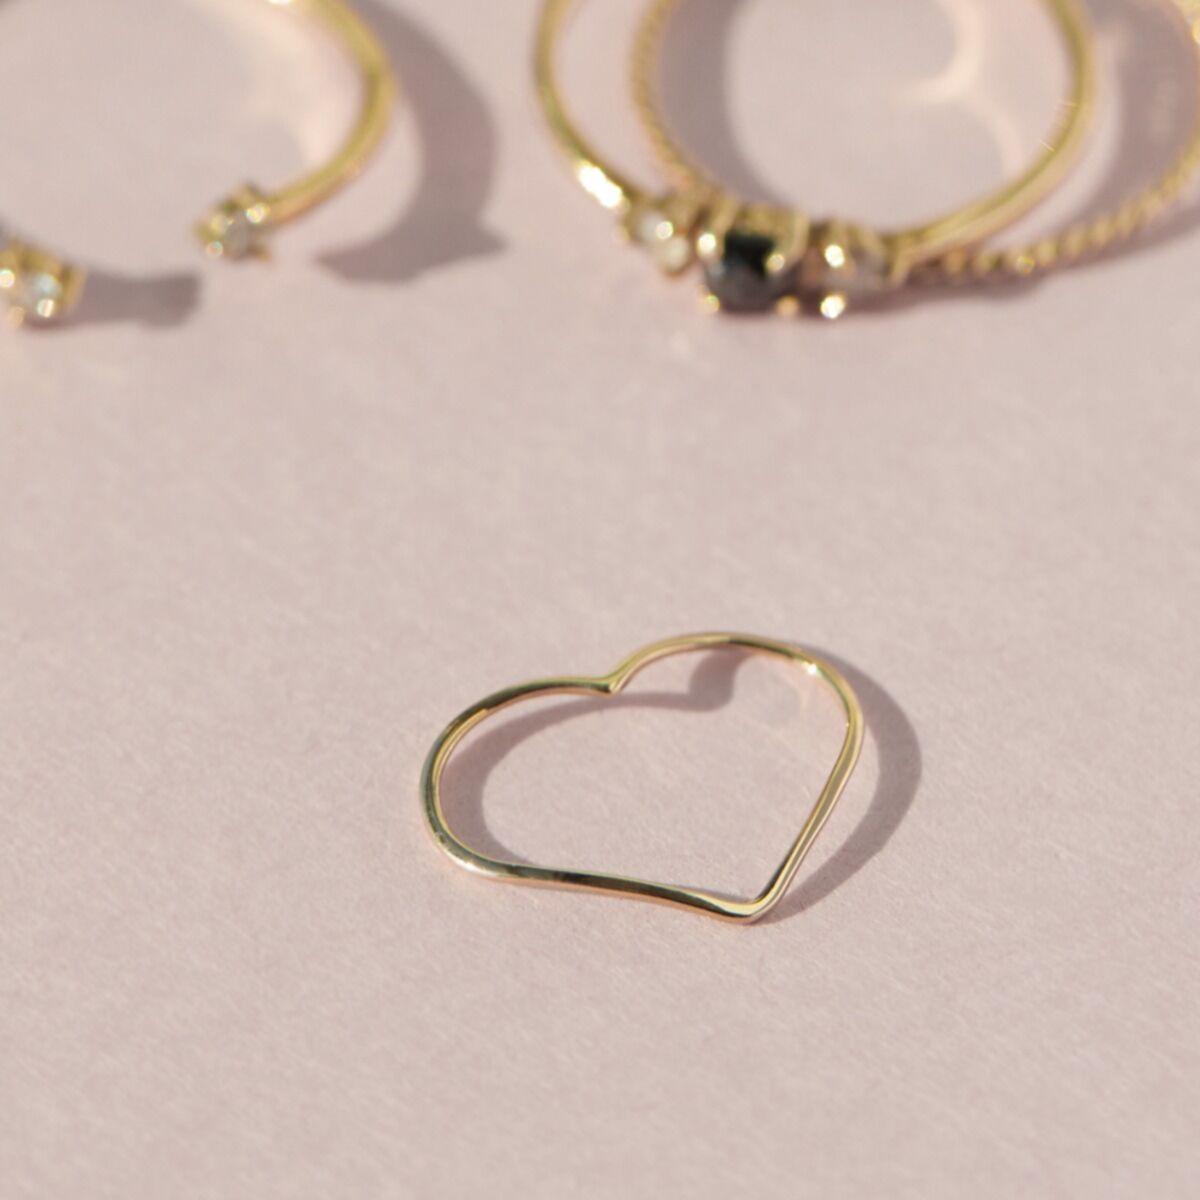 Dainty Heart Charm image